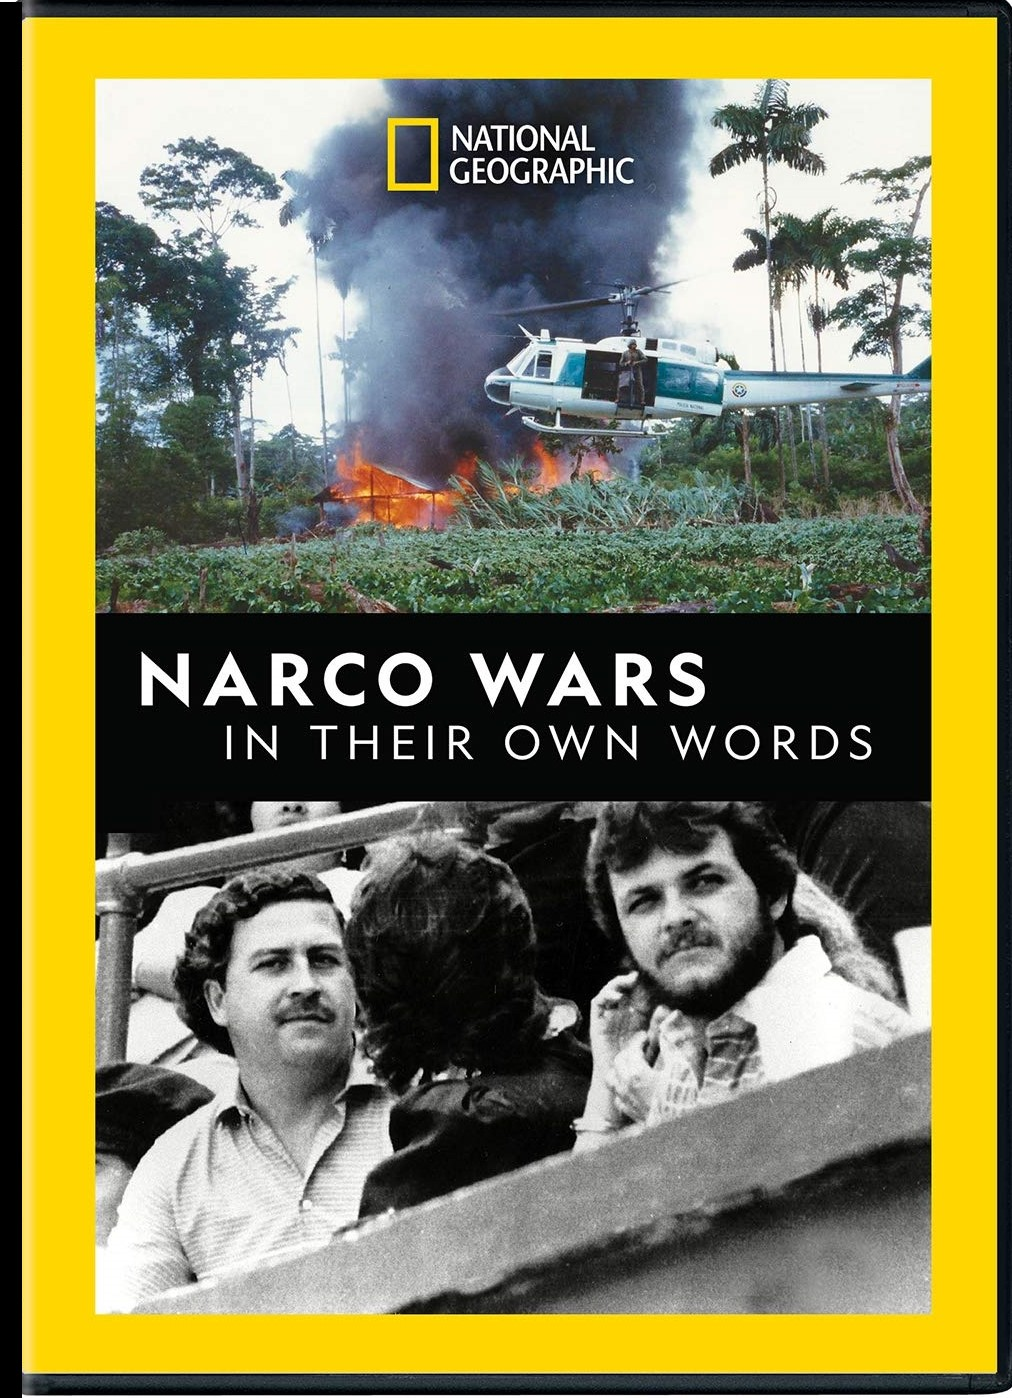 Narco Wars kapak